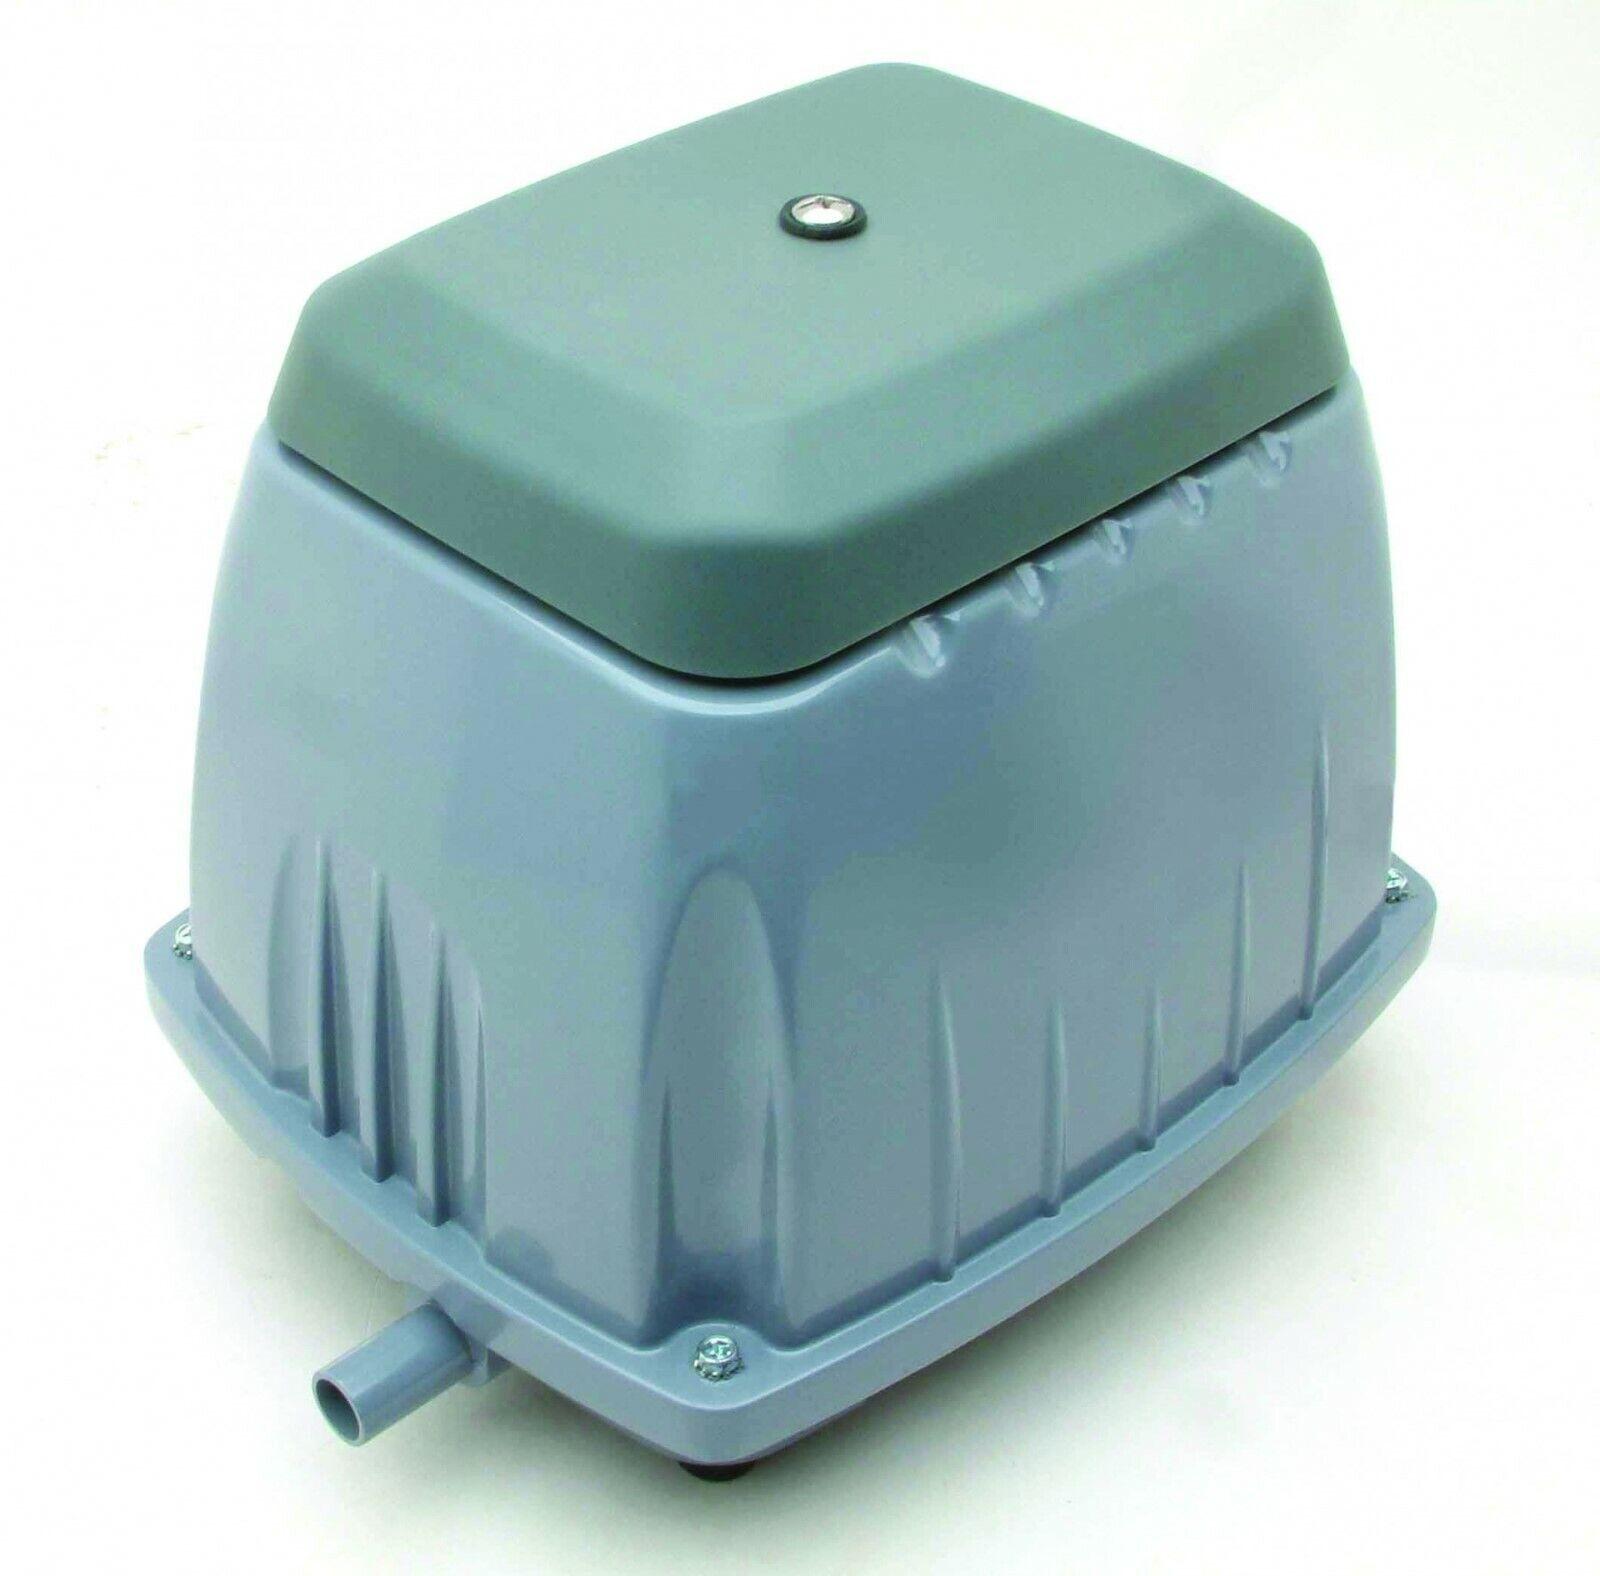 Fish & Aquariums Blue Diamond Et150w Air Pump Pond/septic/aquarium Pet Supplies